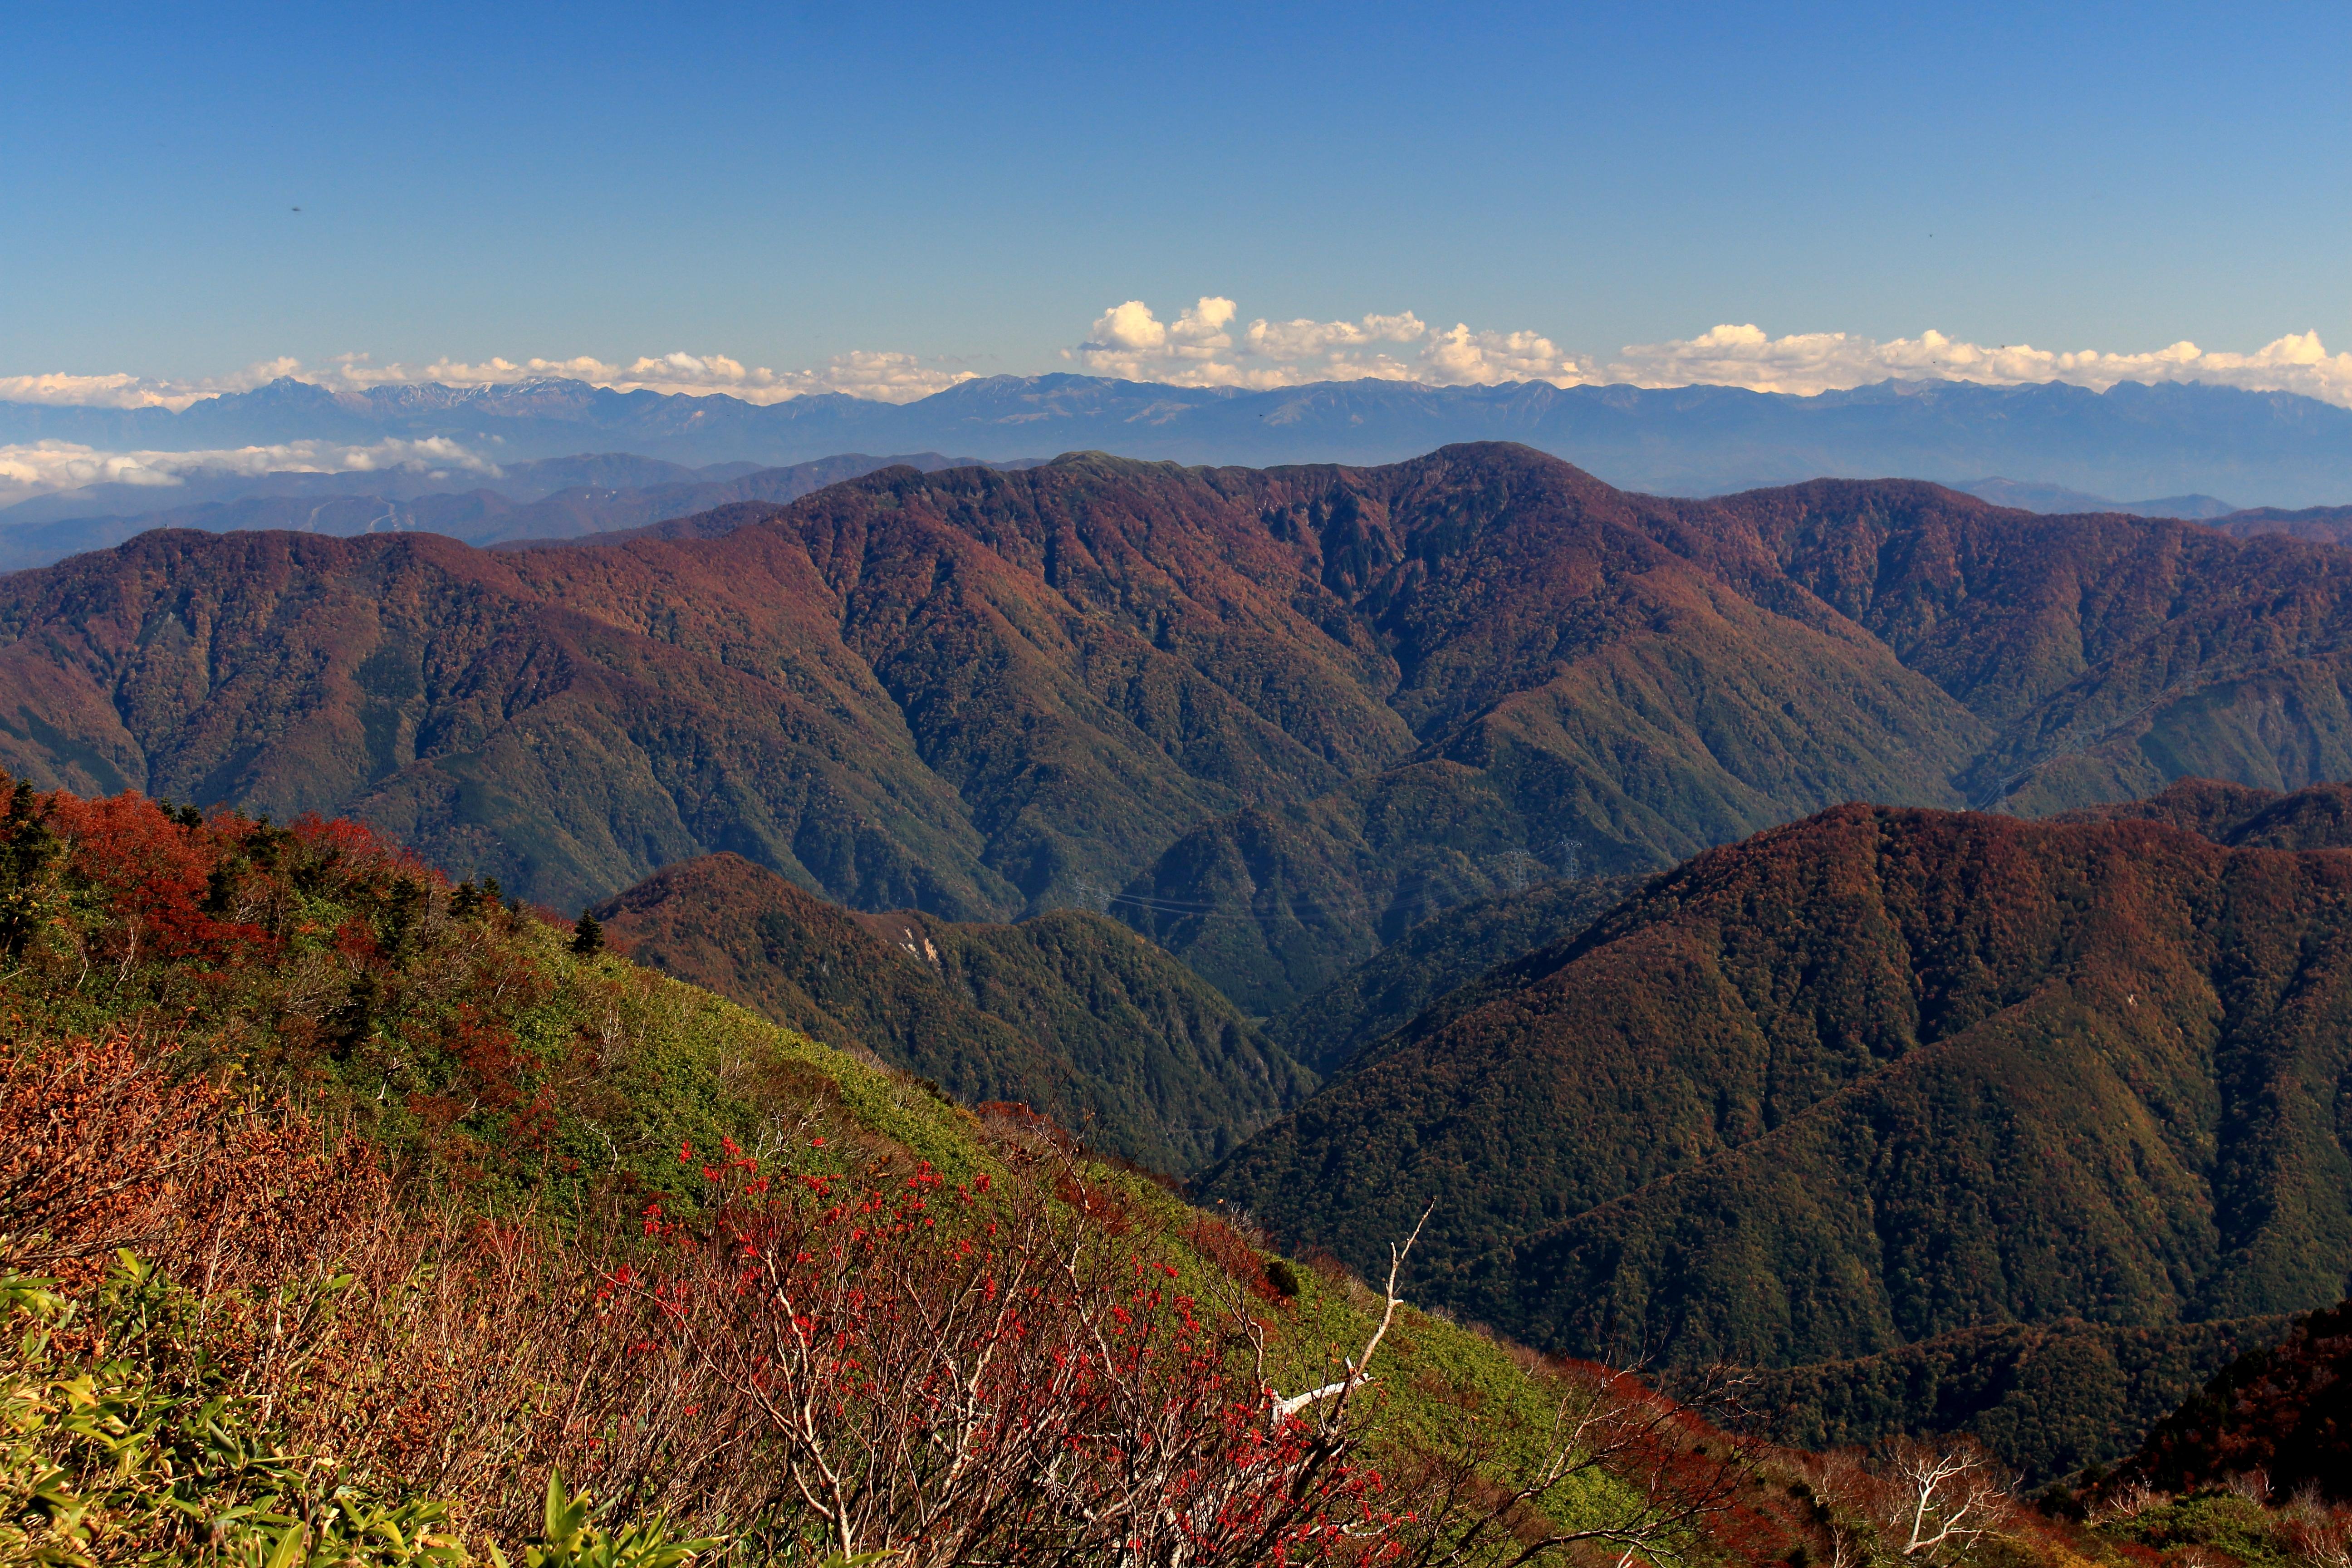 File:Mount Ningyo from Mount Ogasa (2015-10-17).jpg - Wikimedia Commons